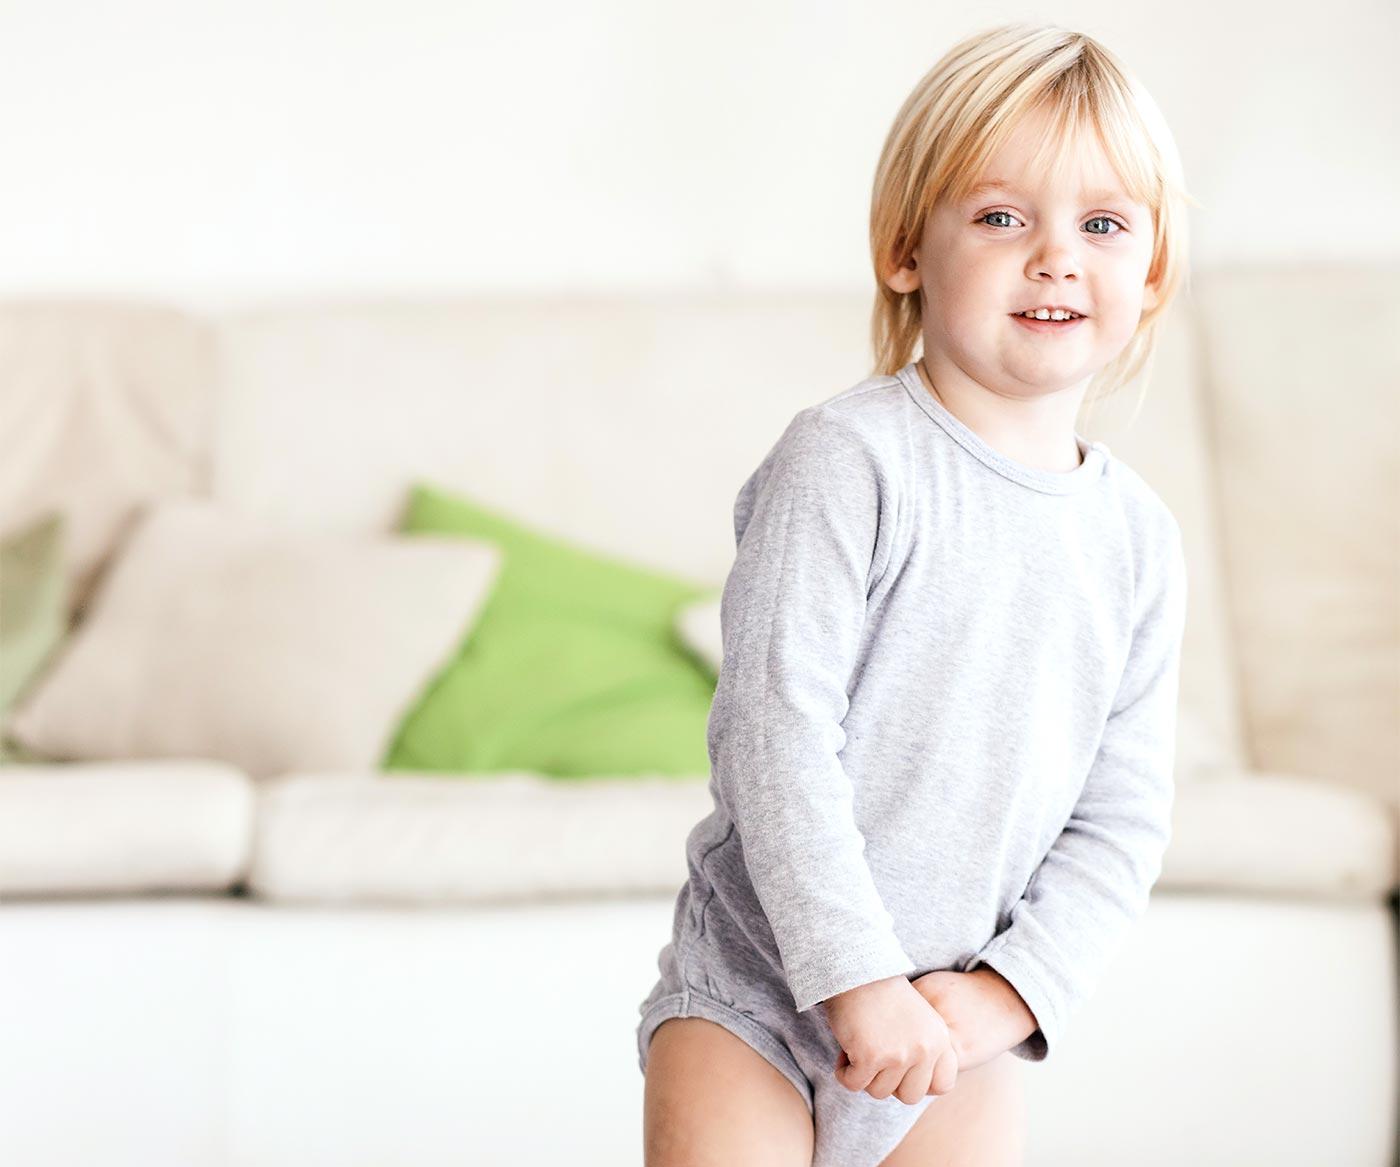 A little boy smiling: helping children make good choices